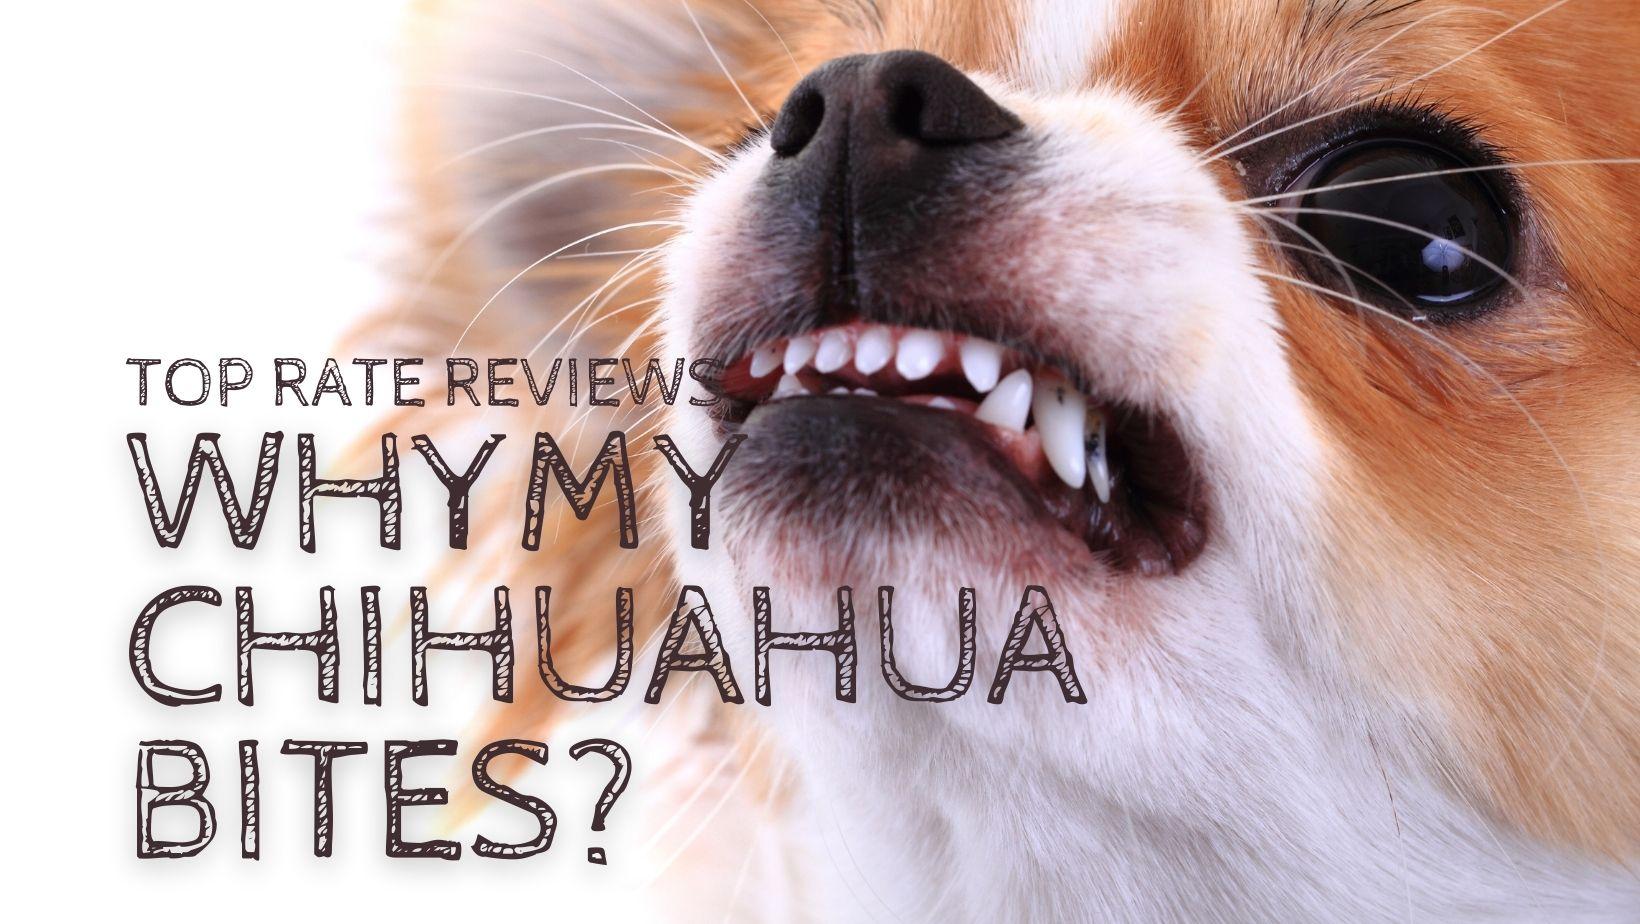 Why My Chihuahua Bites